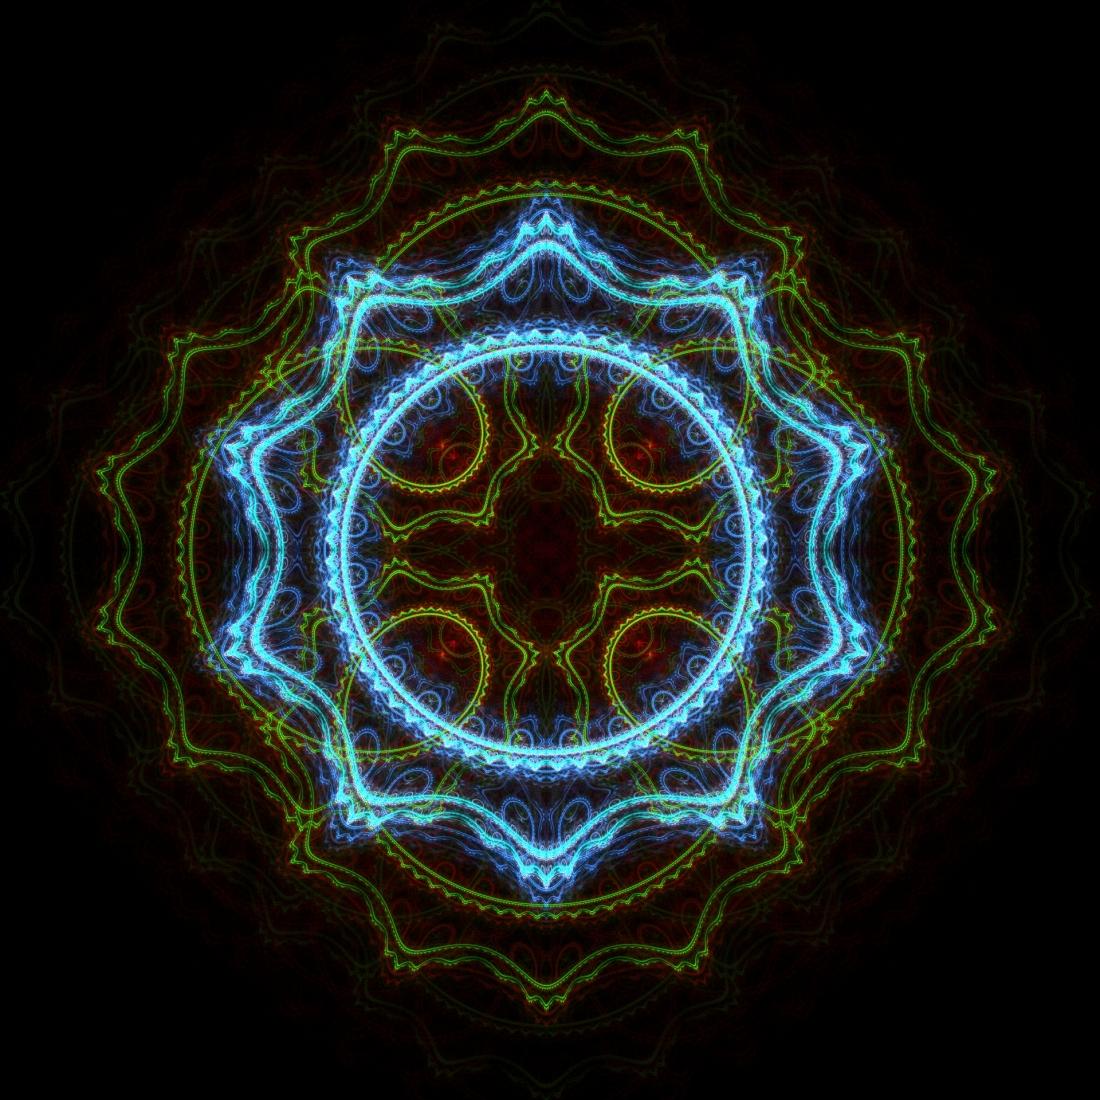 Julian_fractal